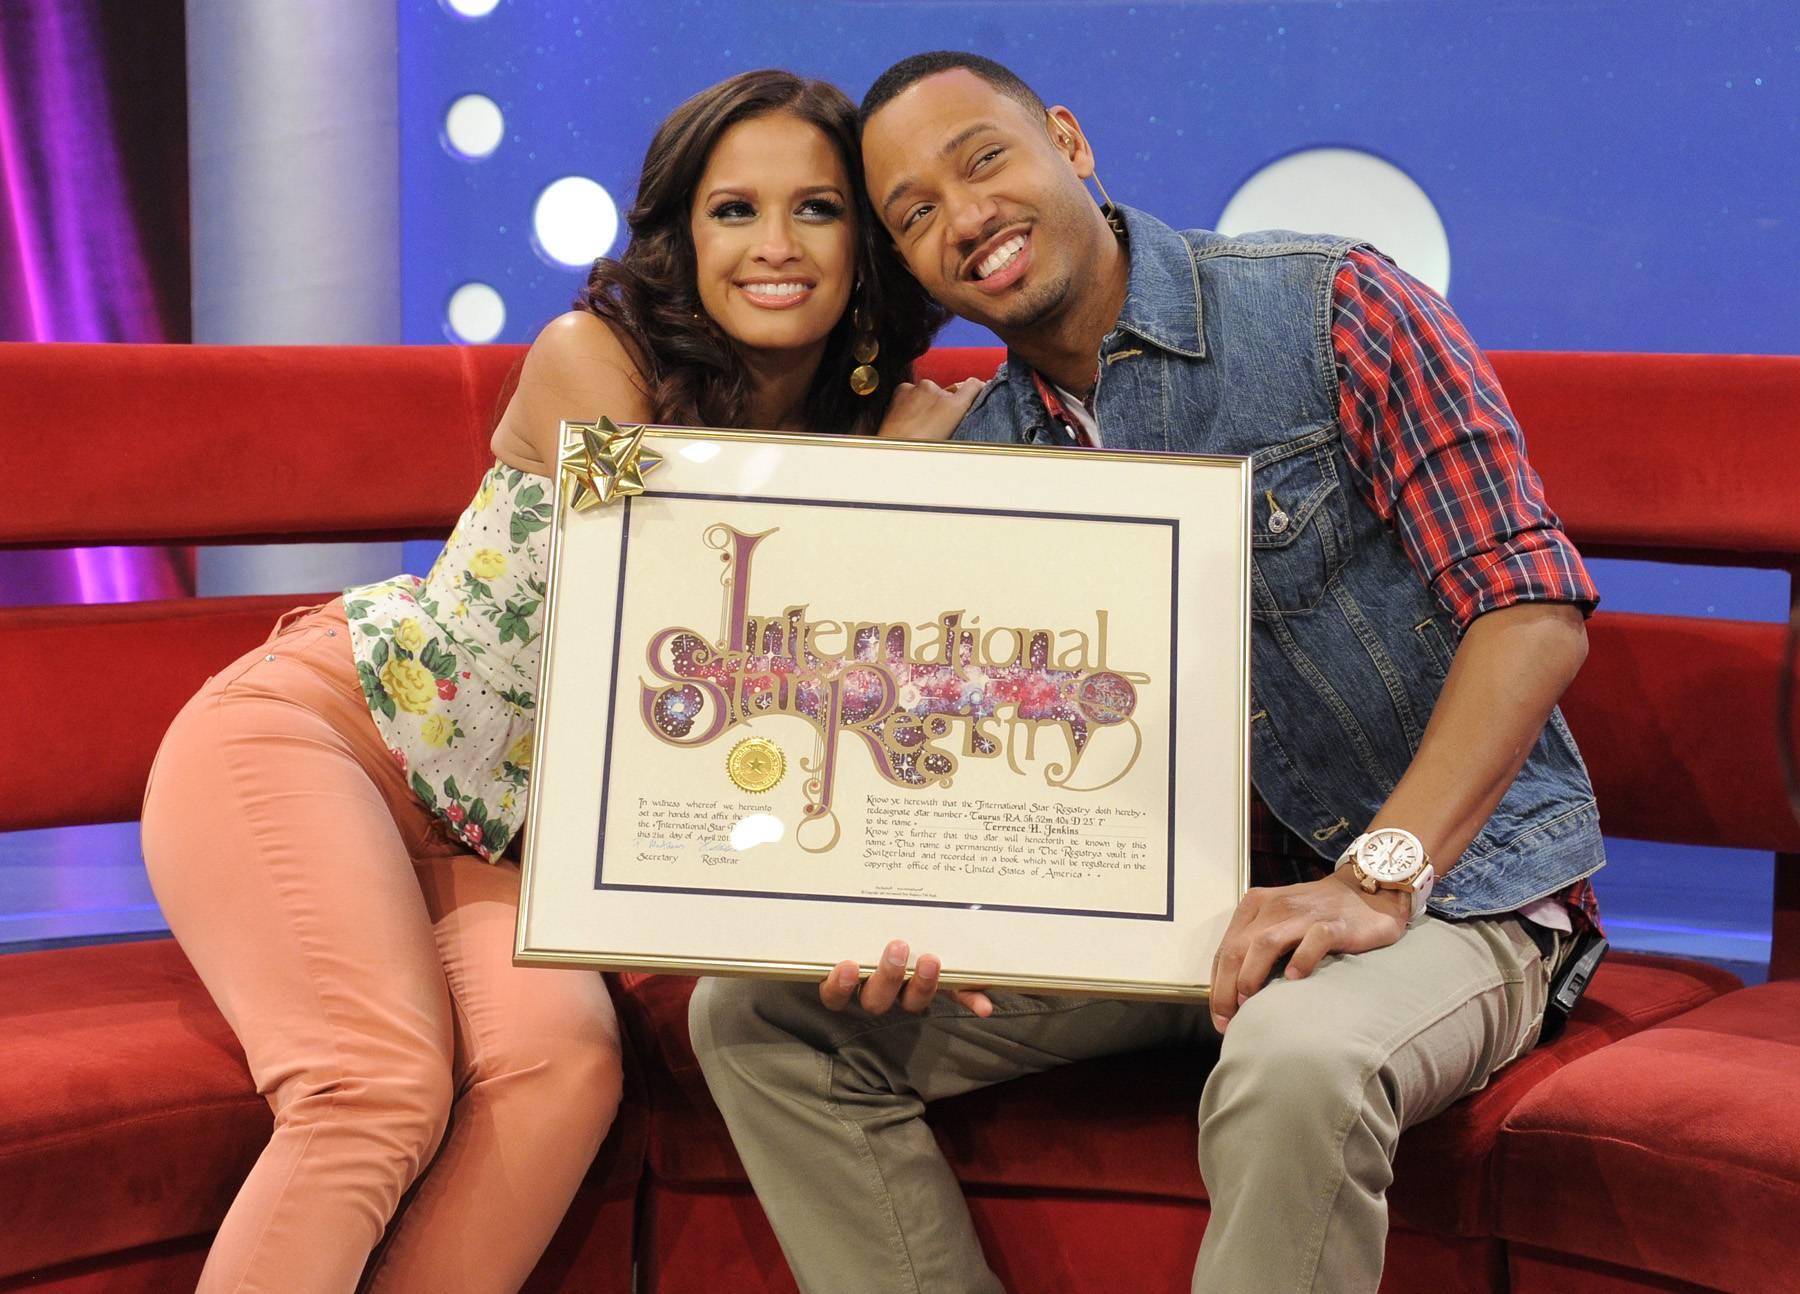 Friends Forever - Terrence J and Rocsi Diaz at 106 & Park, April 20, 2012. (Photo: John Ricard / BET)